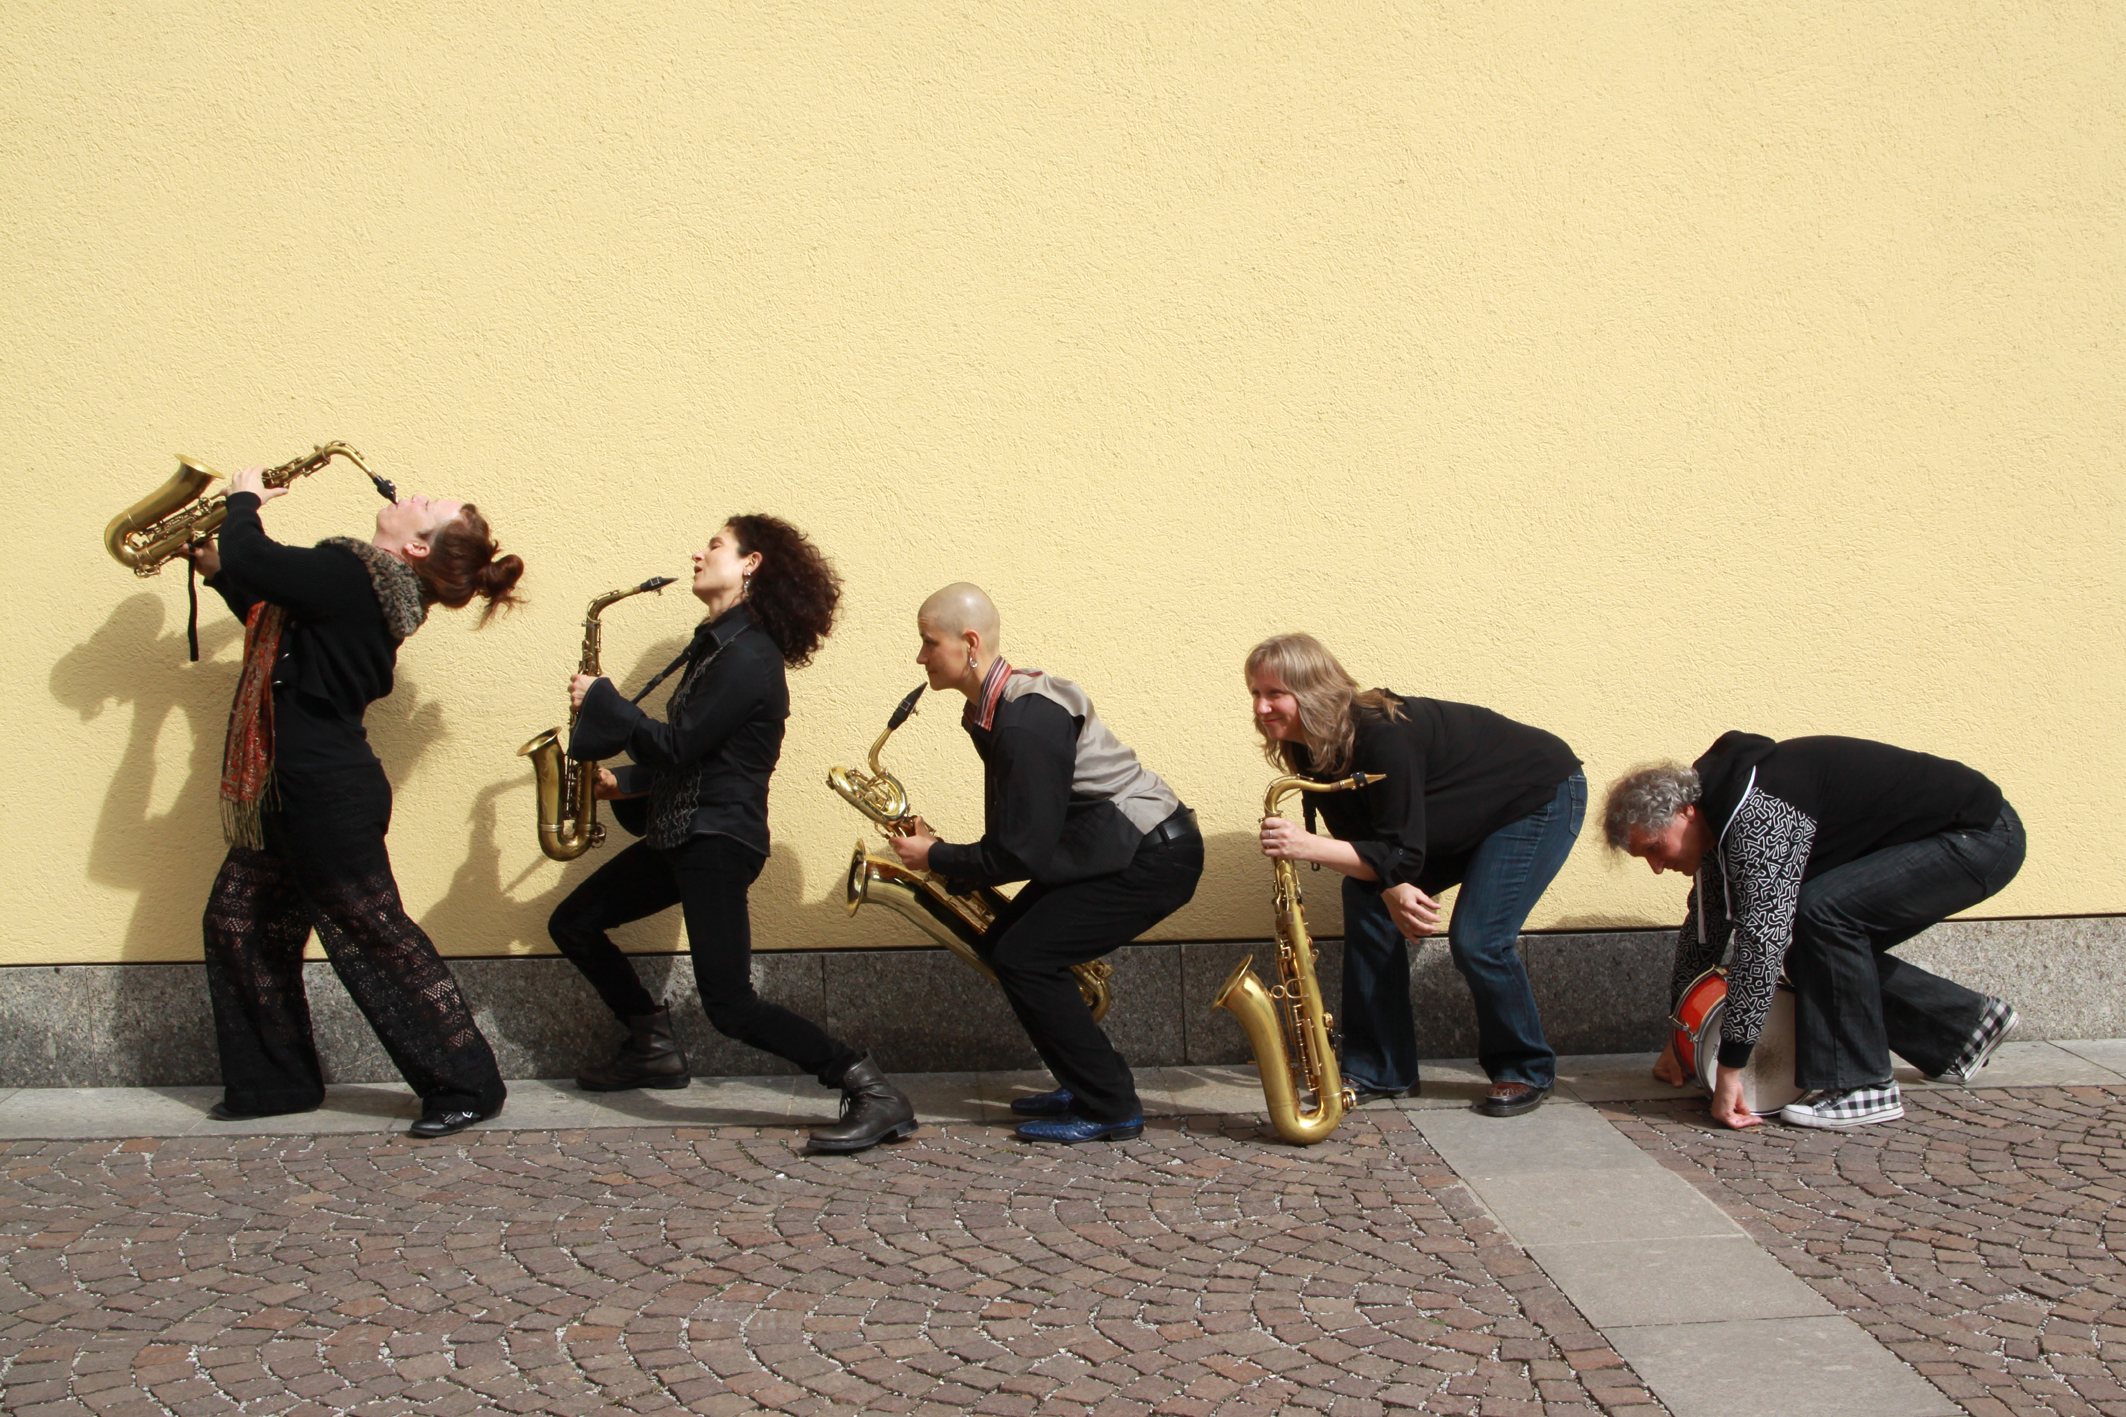 Photo by Ursula Lindenbauer